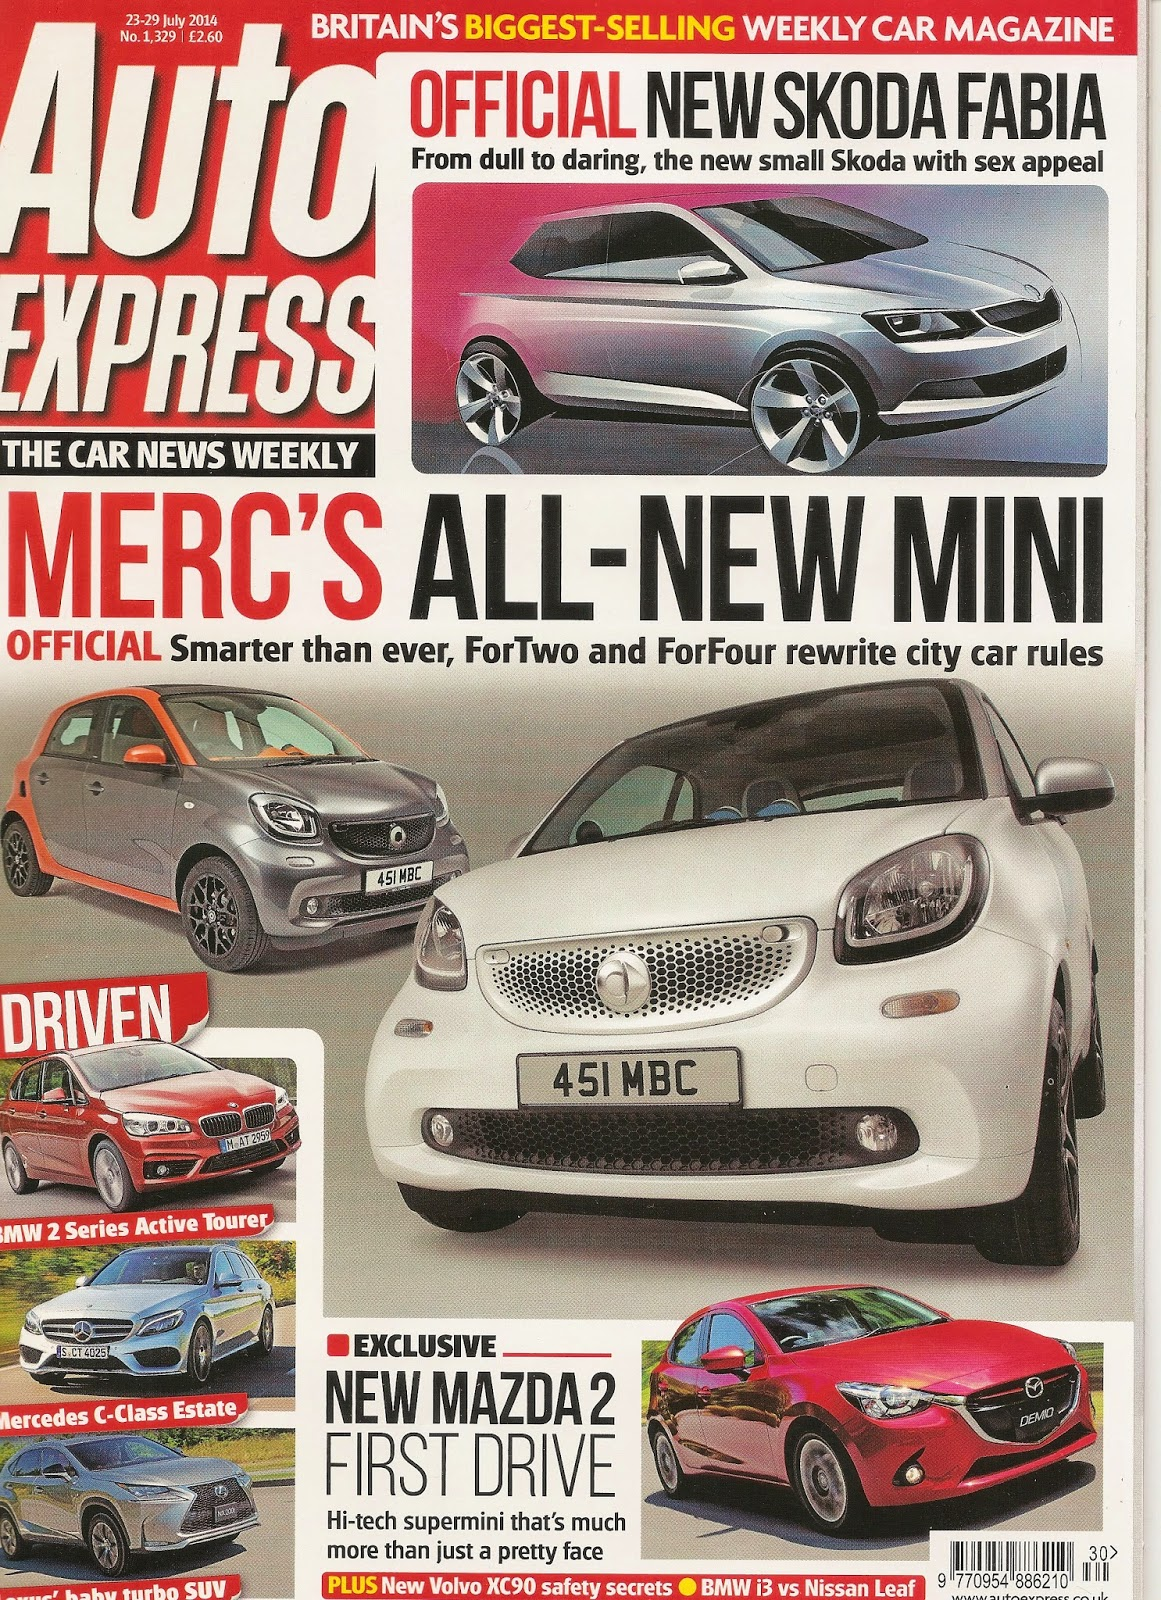 Roj Fashion Lifestyle Auto Express Mercs All New Mini The